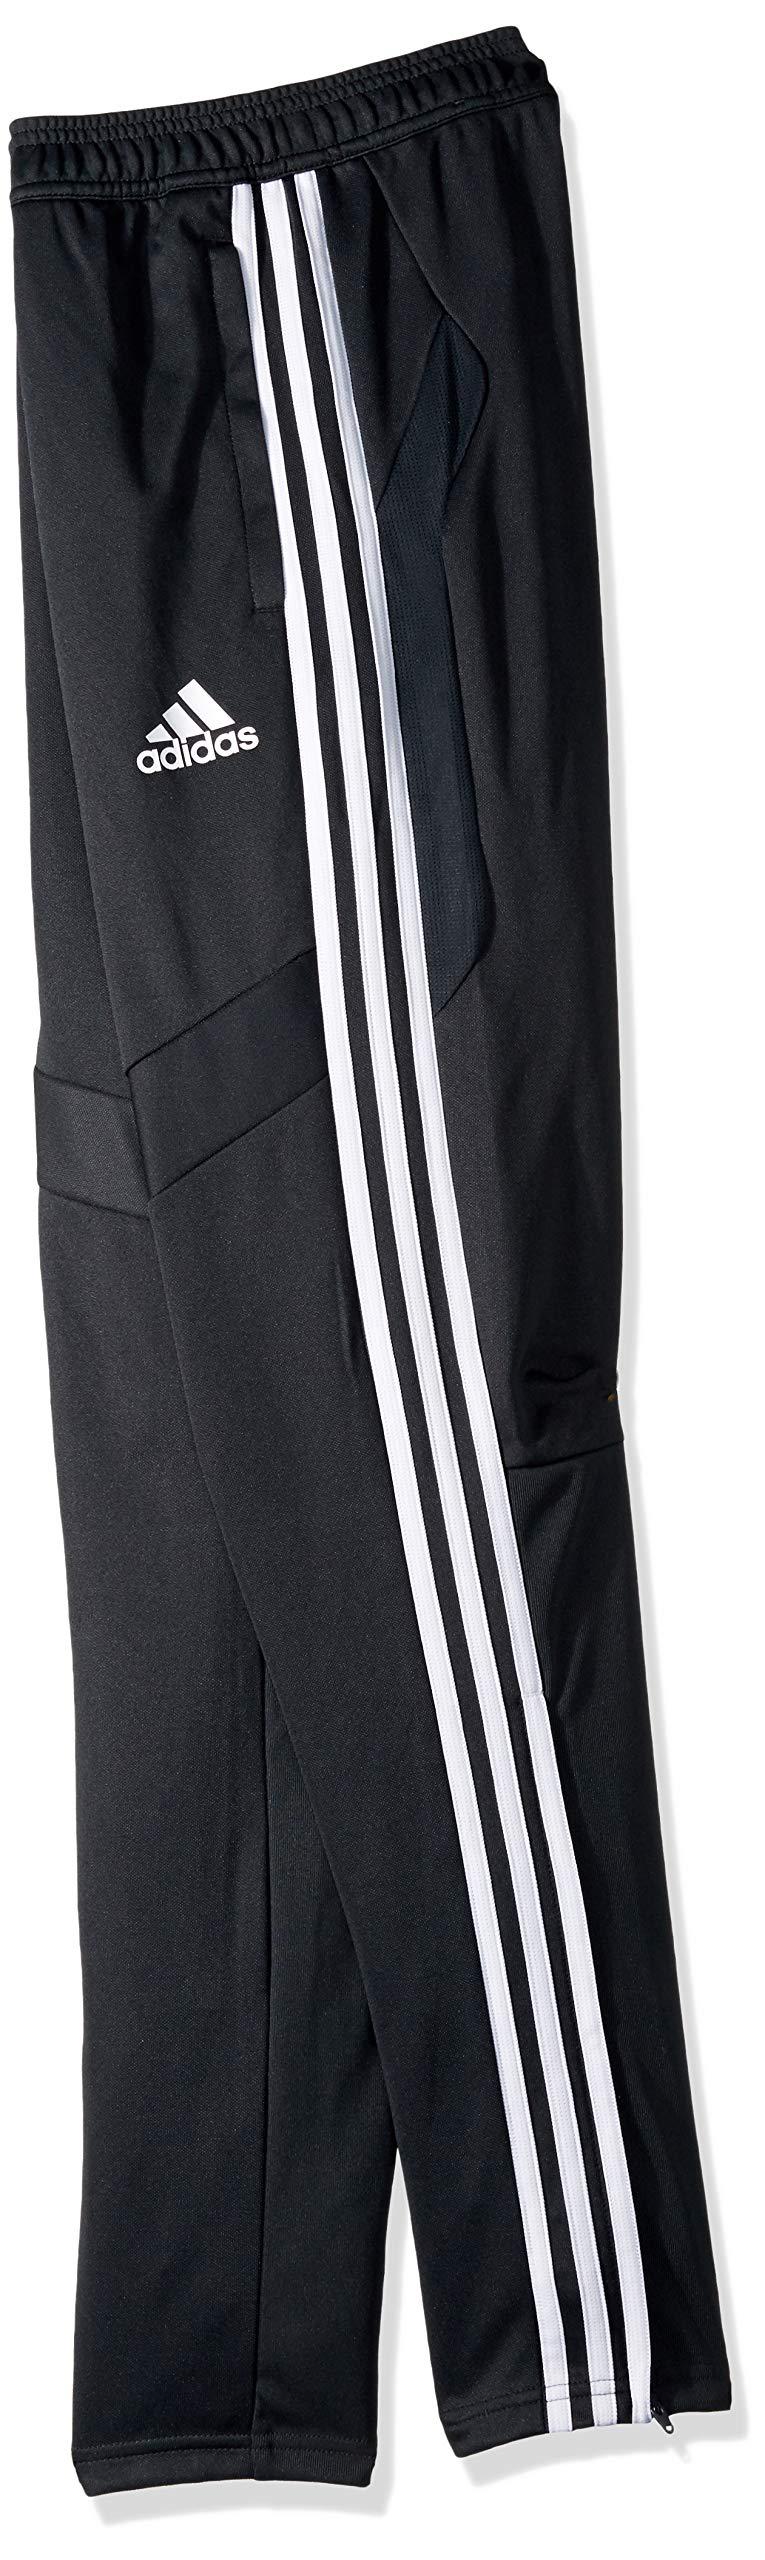 adidas Youth Tiro19 Youth Training Pants, Dark Grey/White, XX-Small by adidas (Image #2)